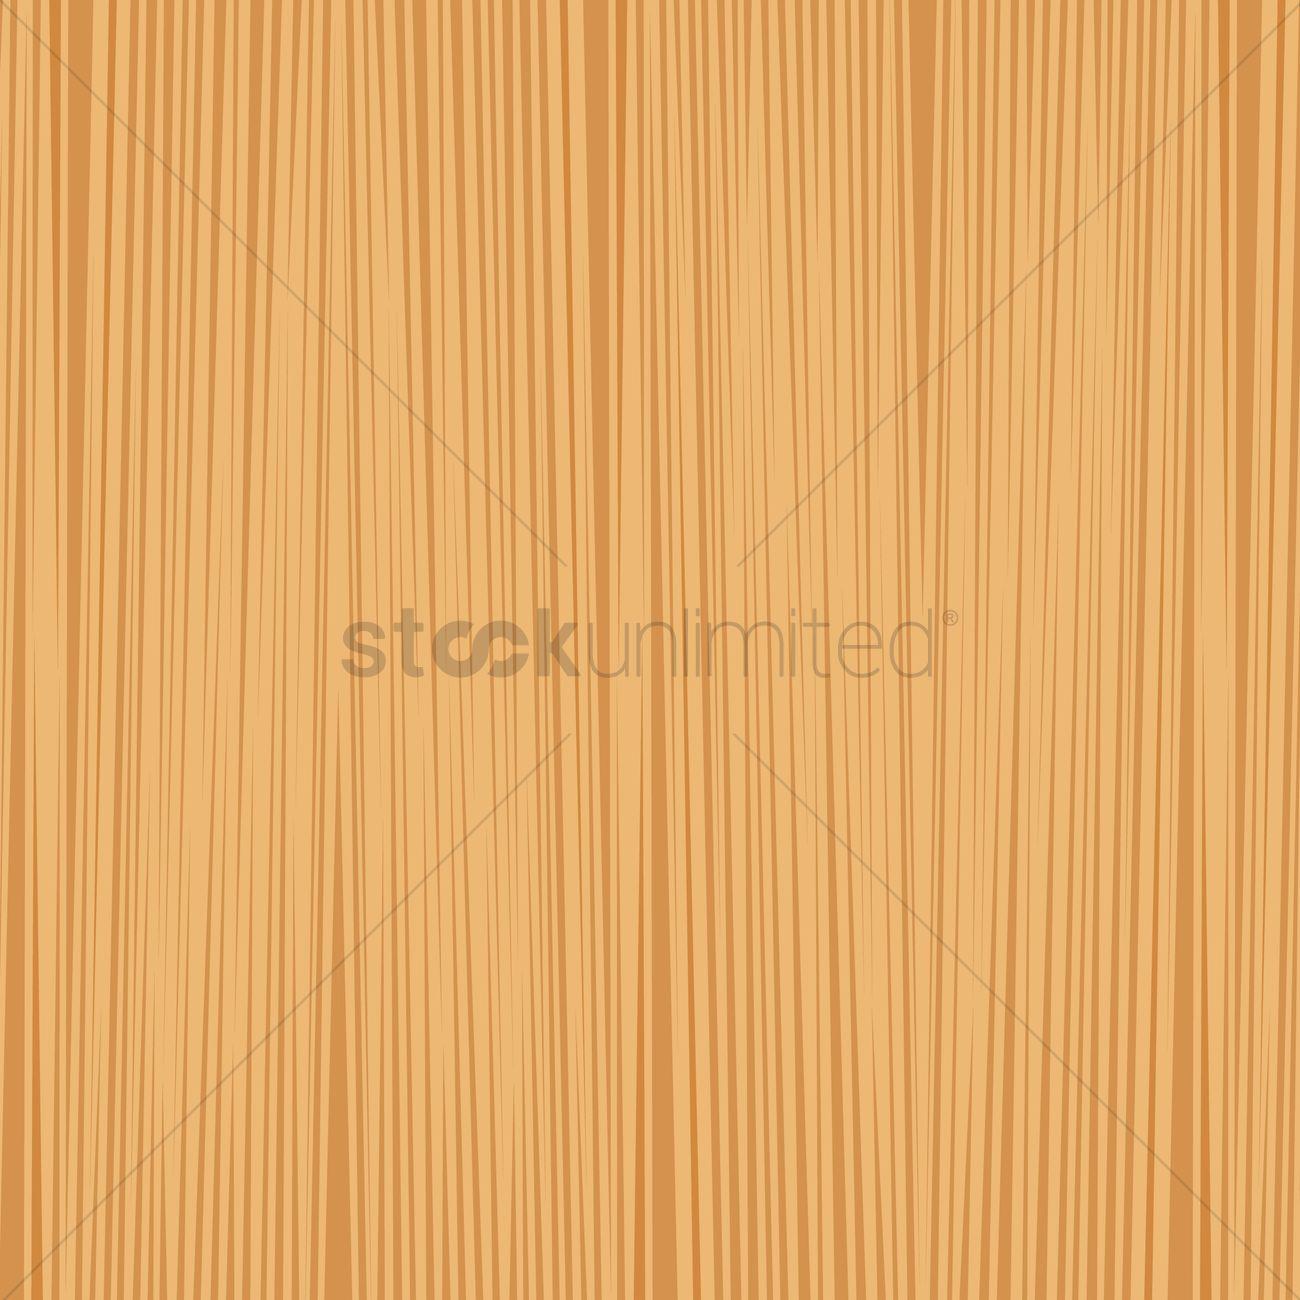 Chicago Flag On Wood Texture Background Stock Illustration 448850908